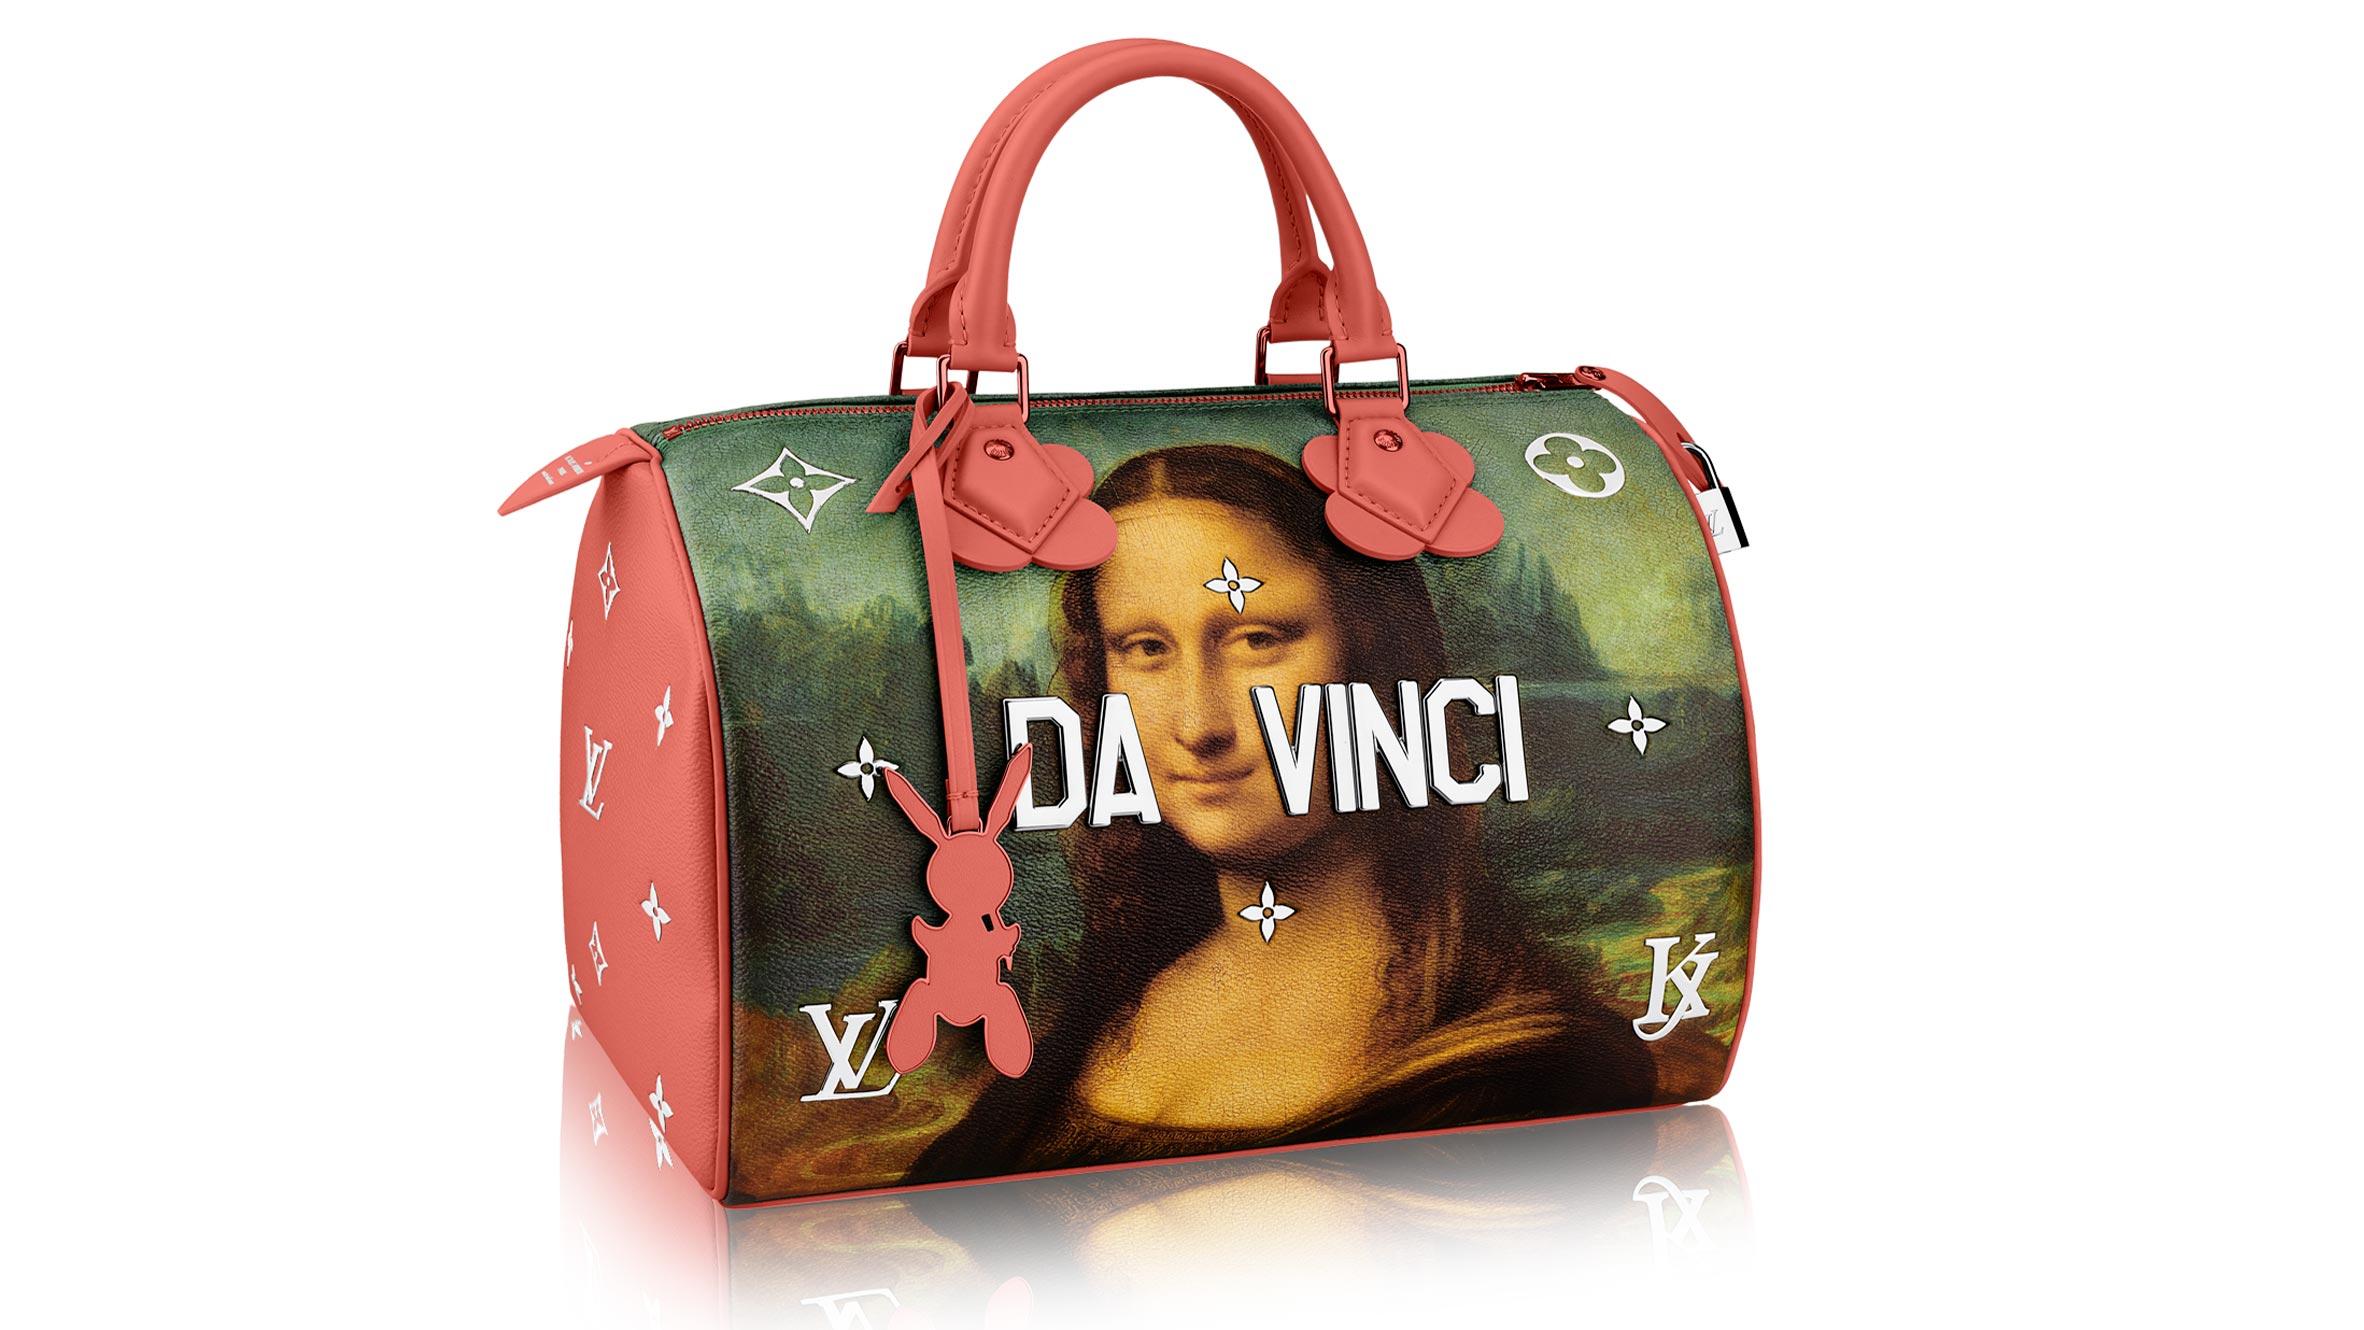 Da Vinci handbag